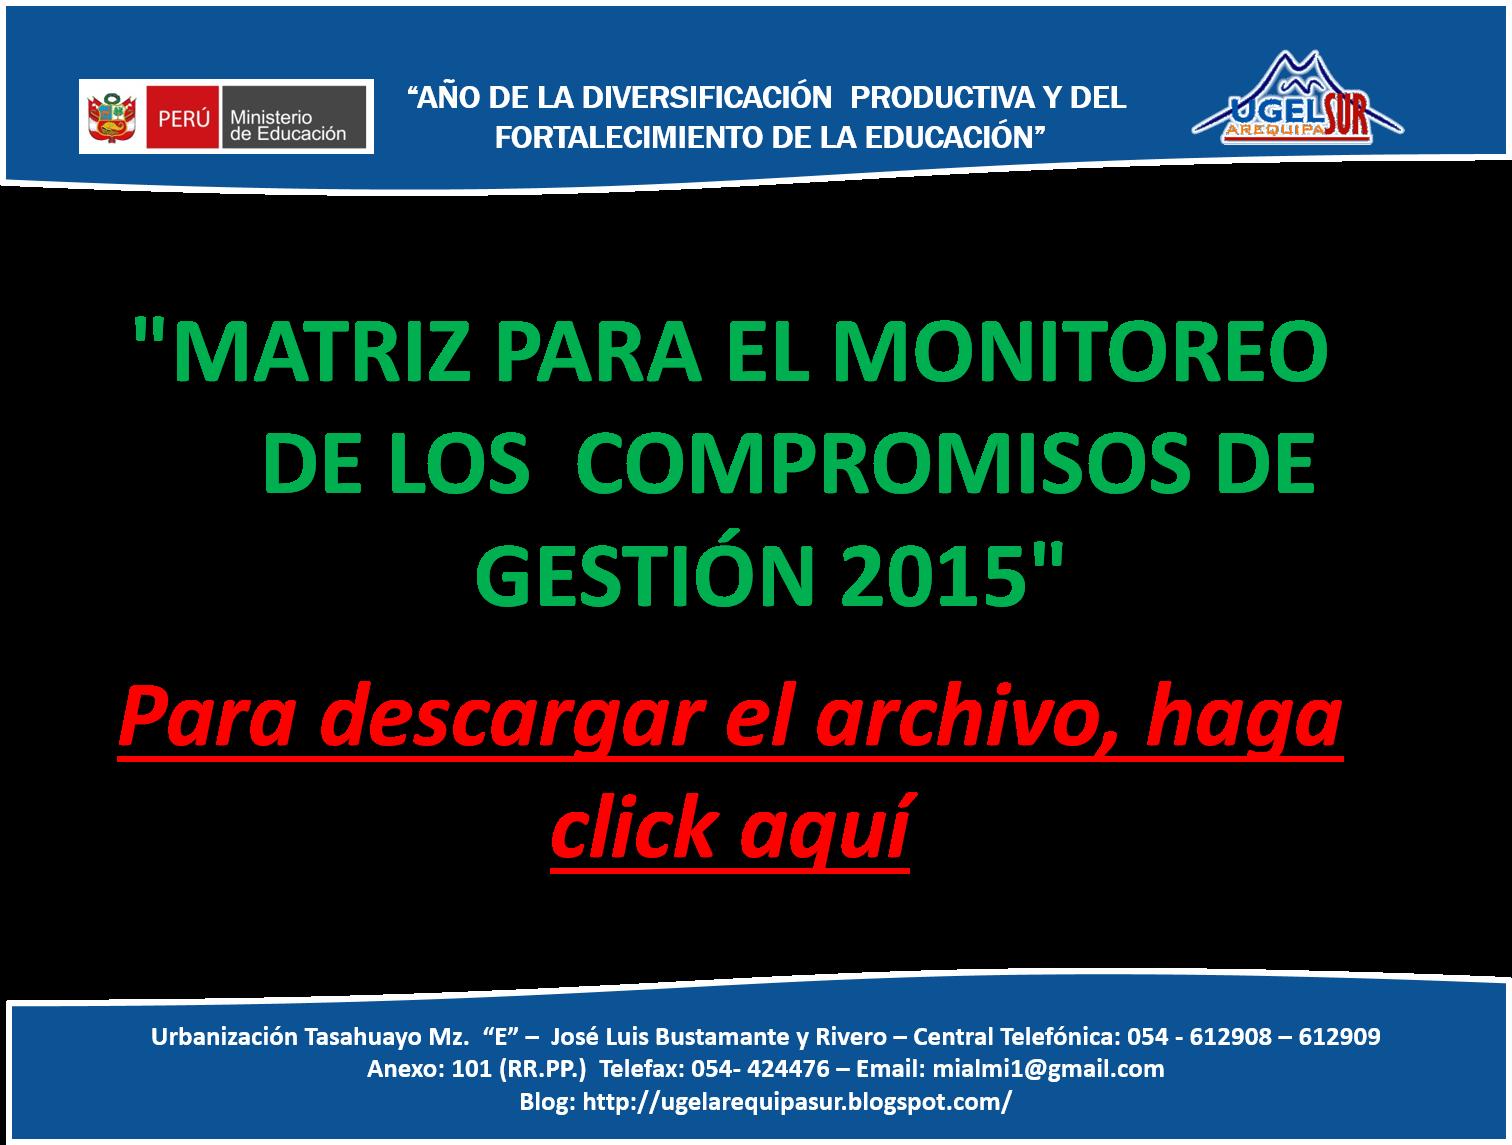 MATRIZ DE COMPROMISOS - 2015